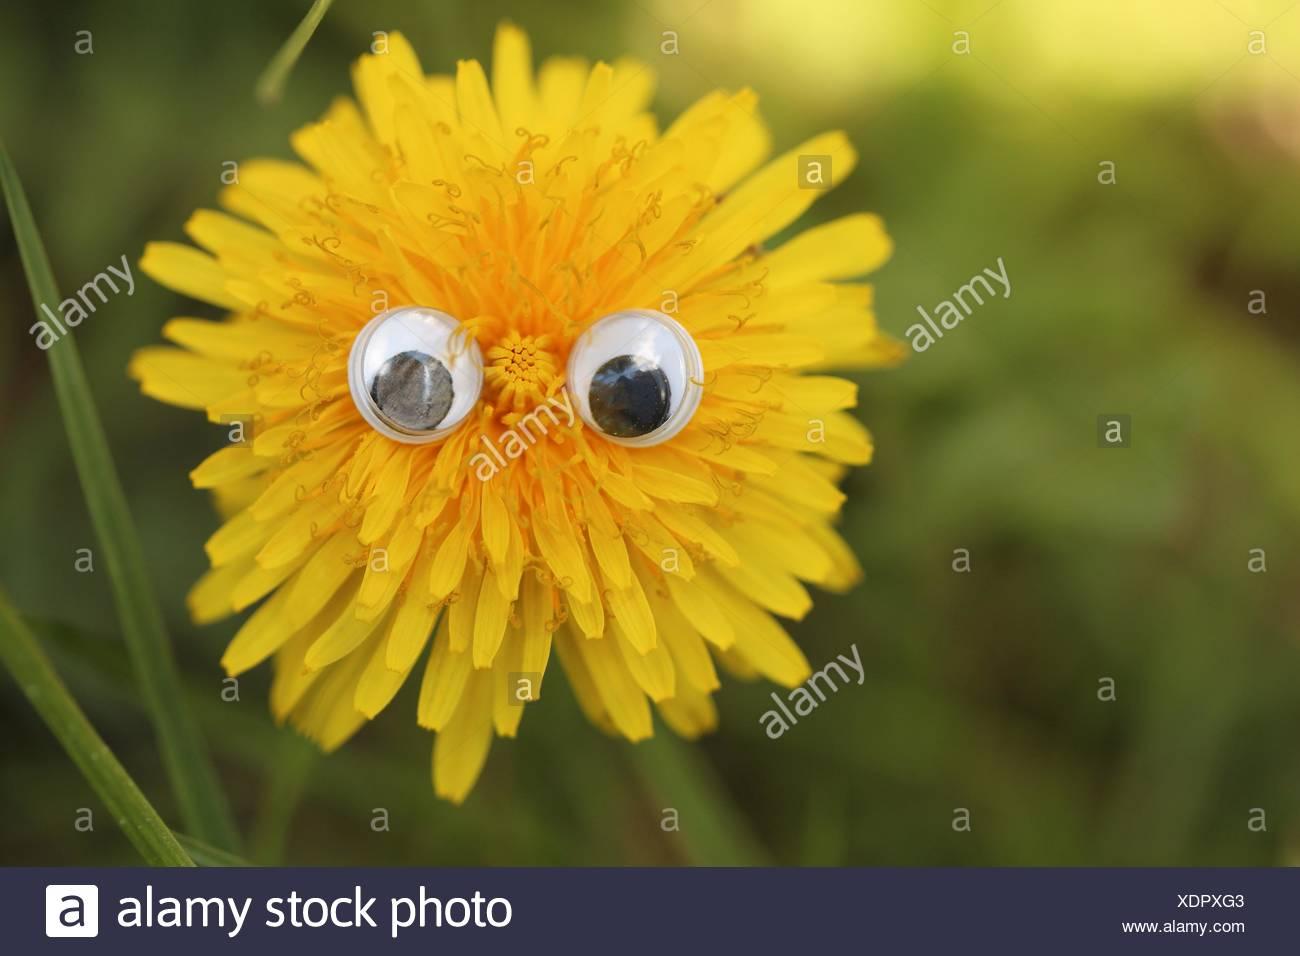 Plastic Eyeballs On Yellow Flower Head - Stock Image